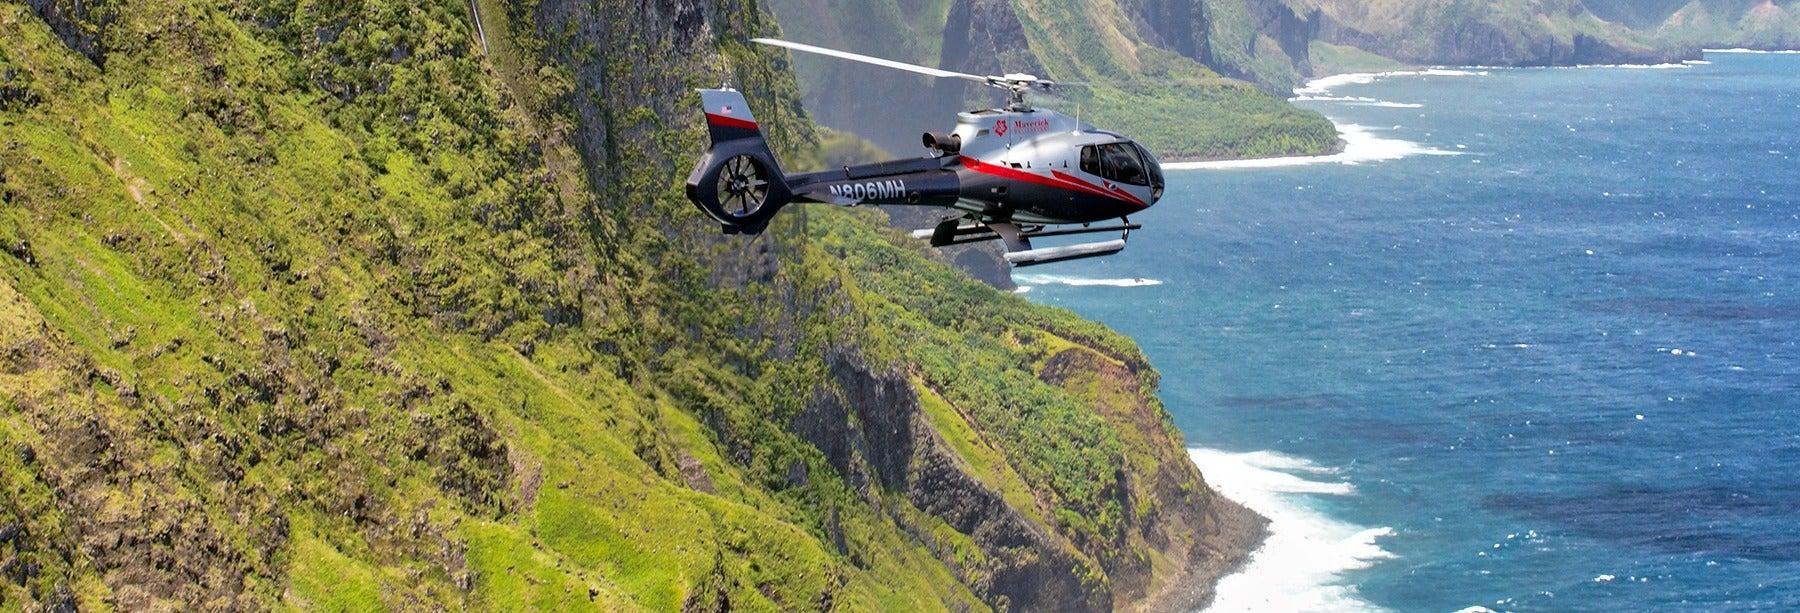 Paseo en helicóptero por la selva tropical de Hana